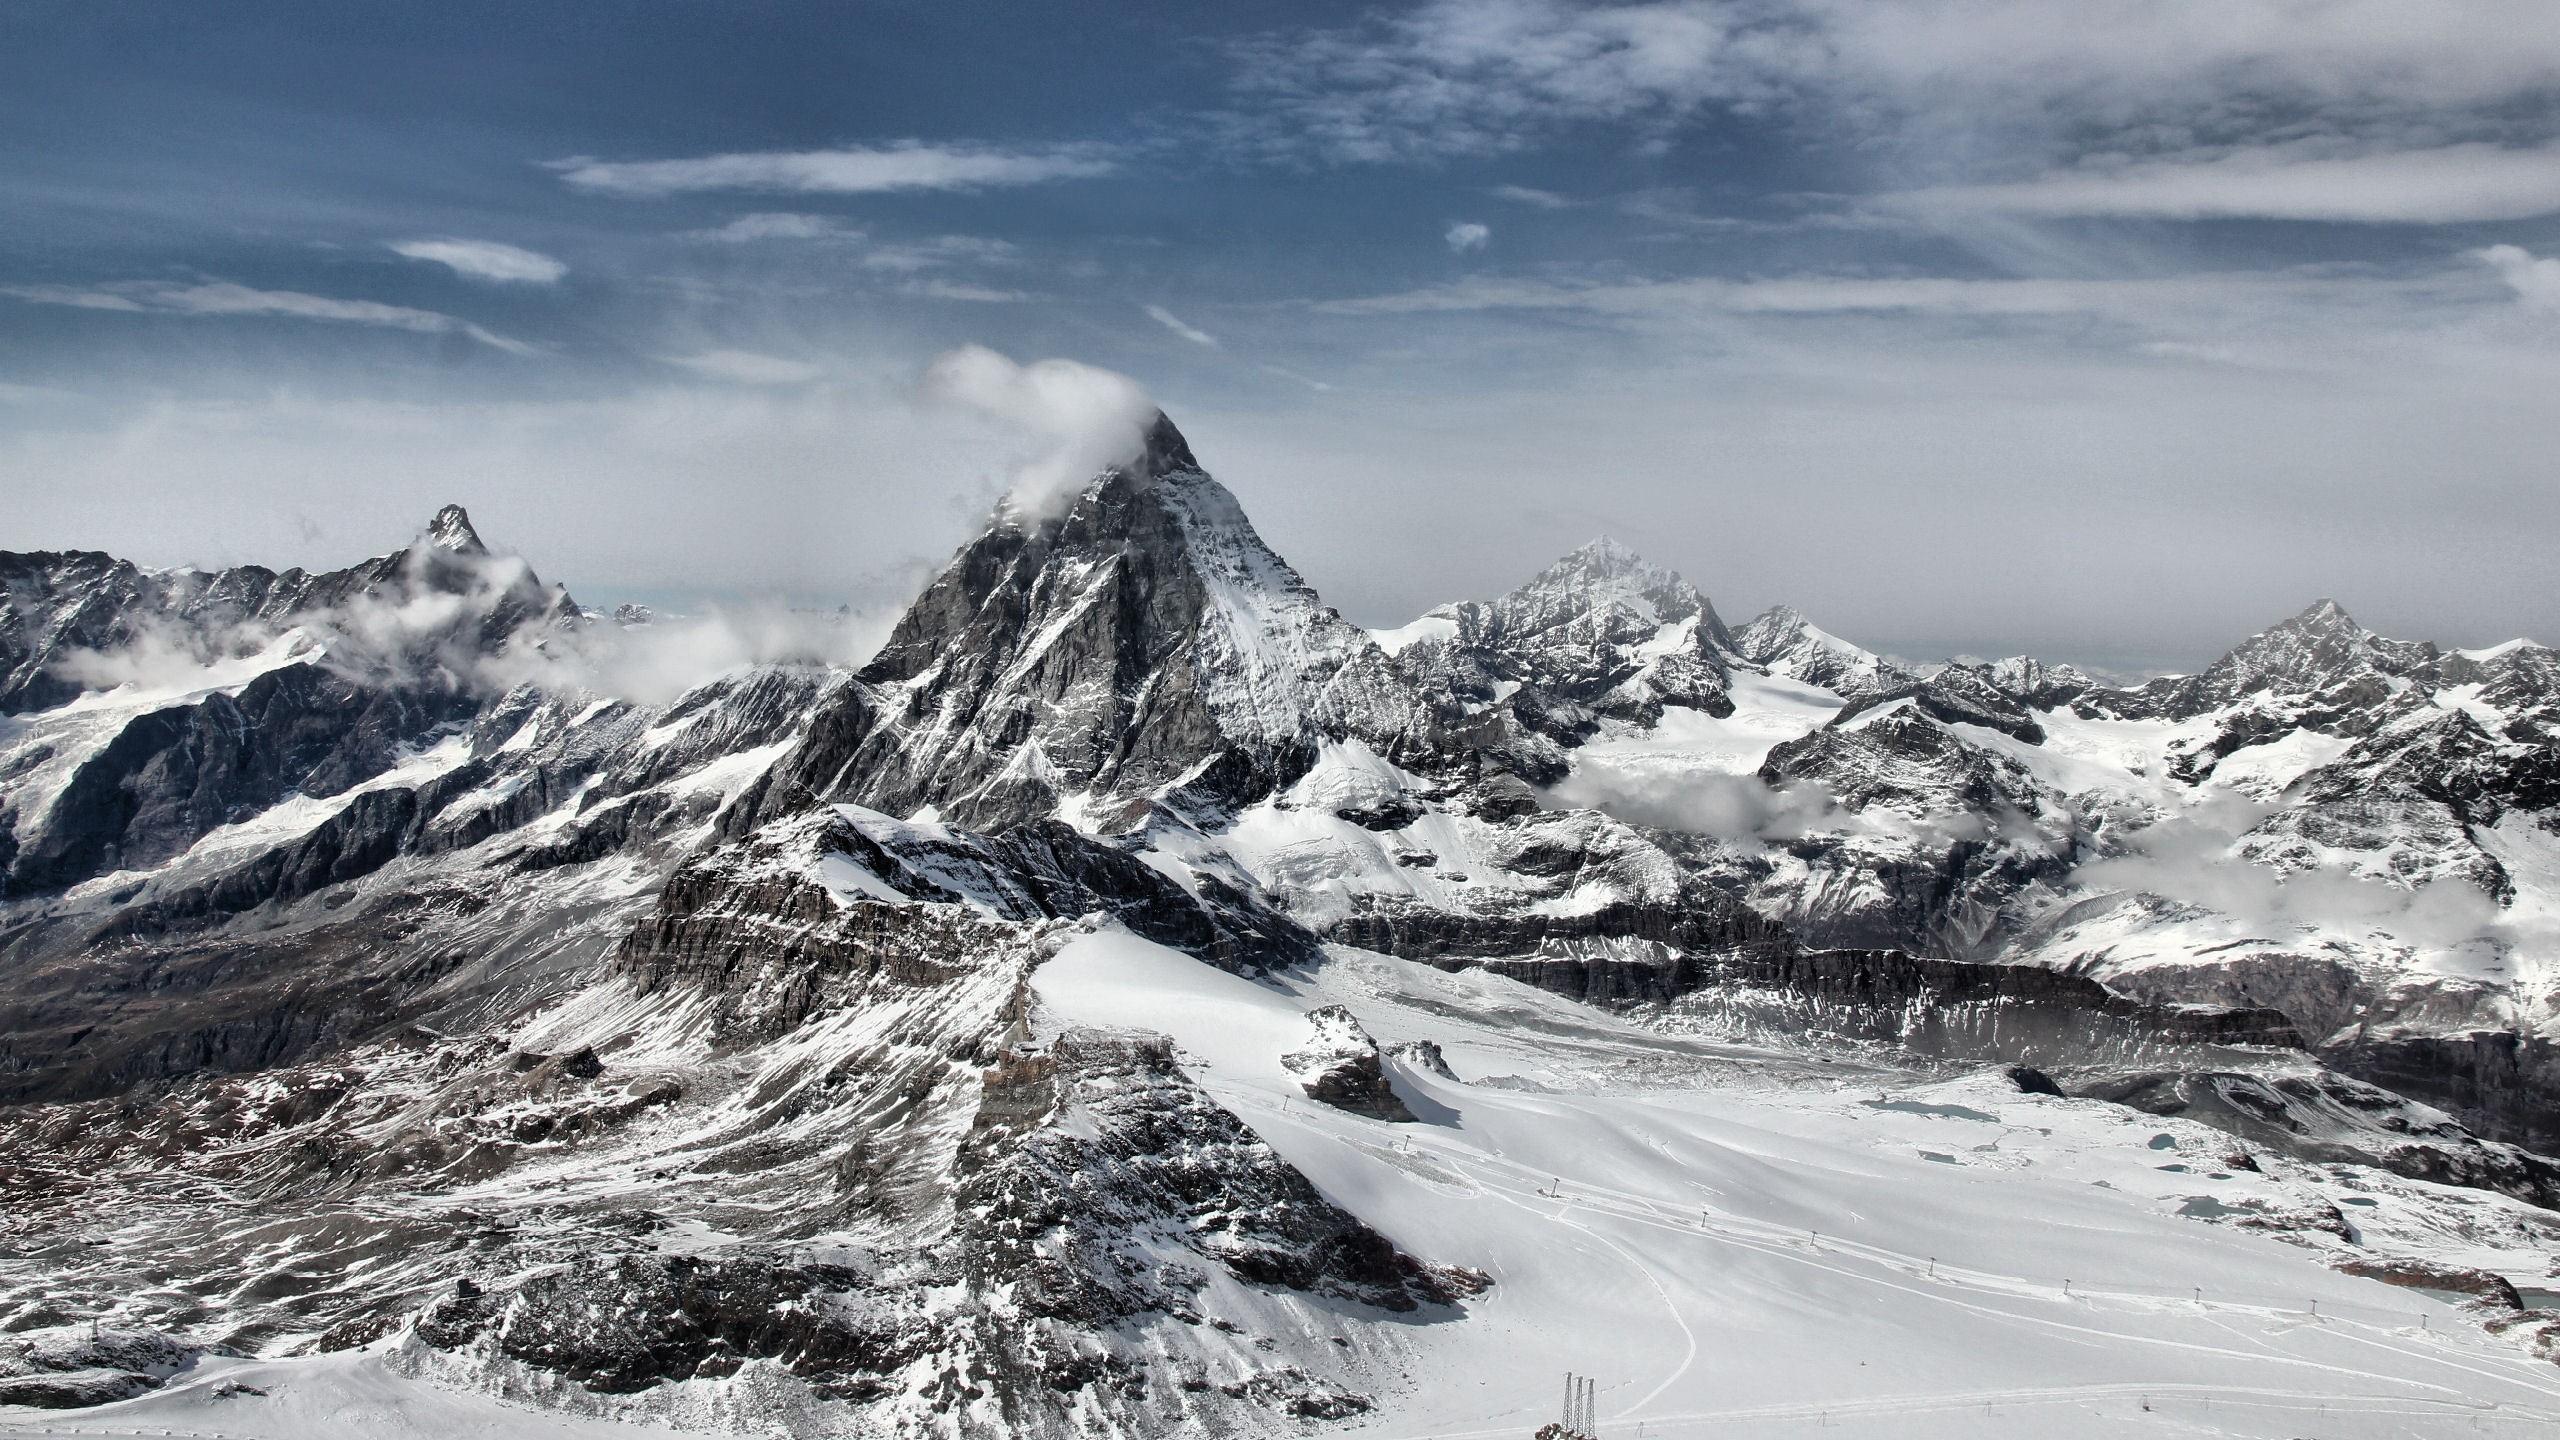 Wallpaper landscape, winter, mountain, peak, top, clouds, white